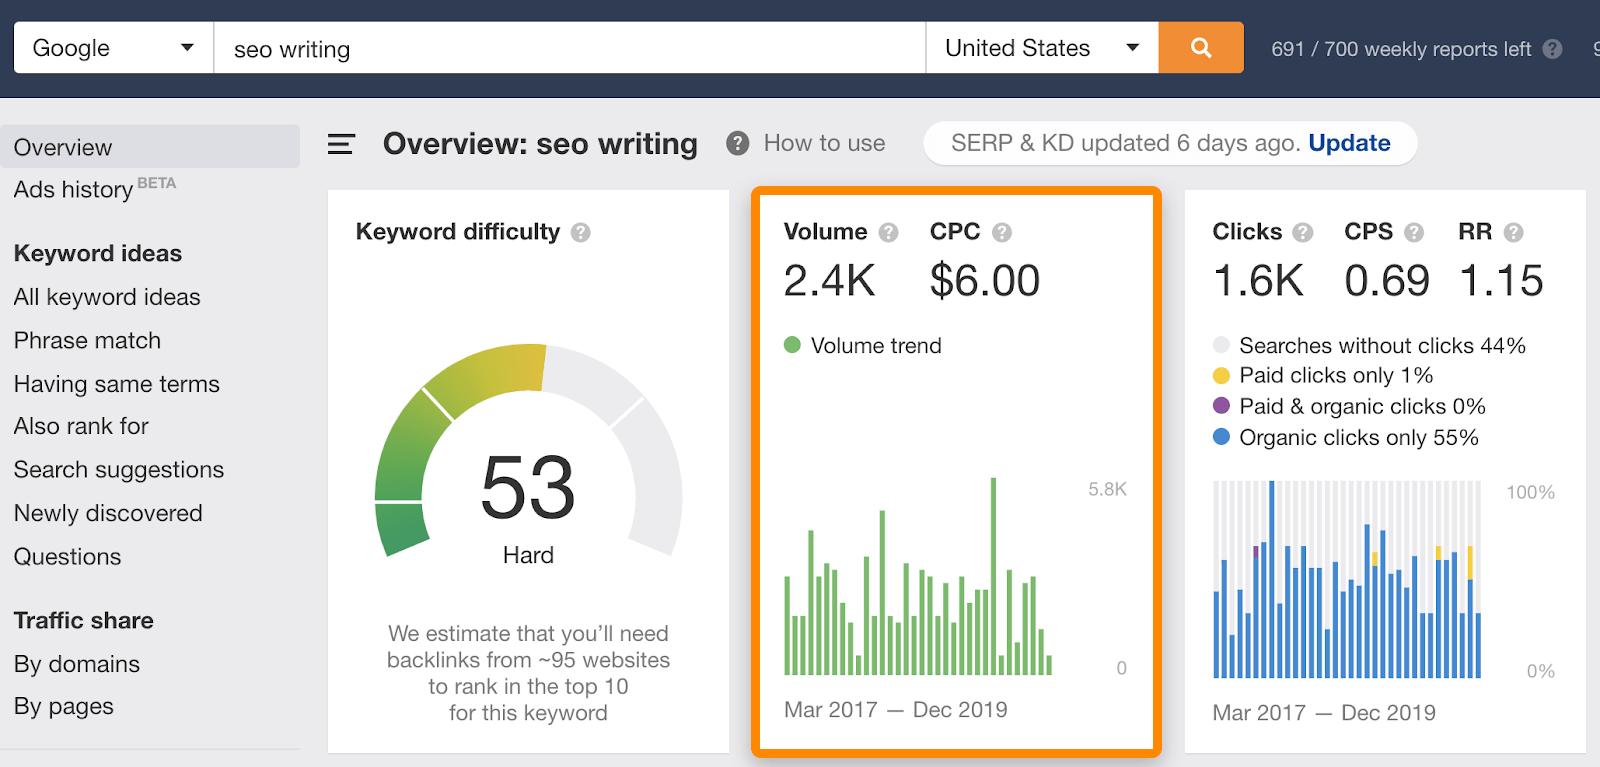 6 seo writing keyword